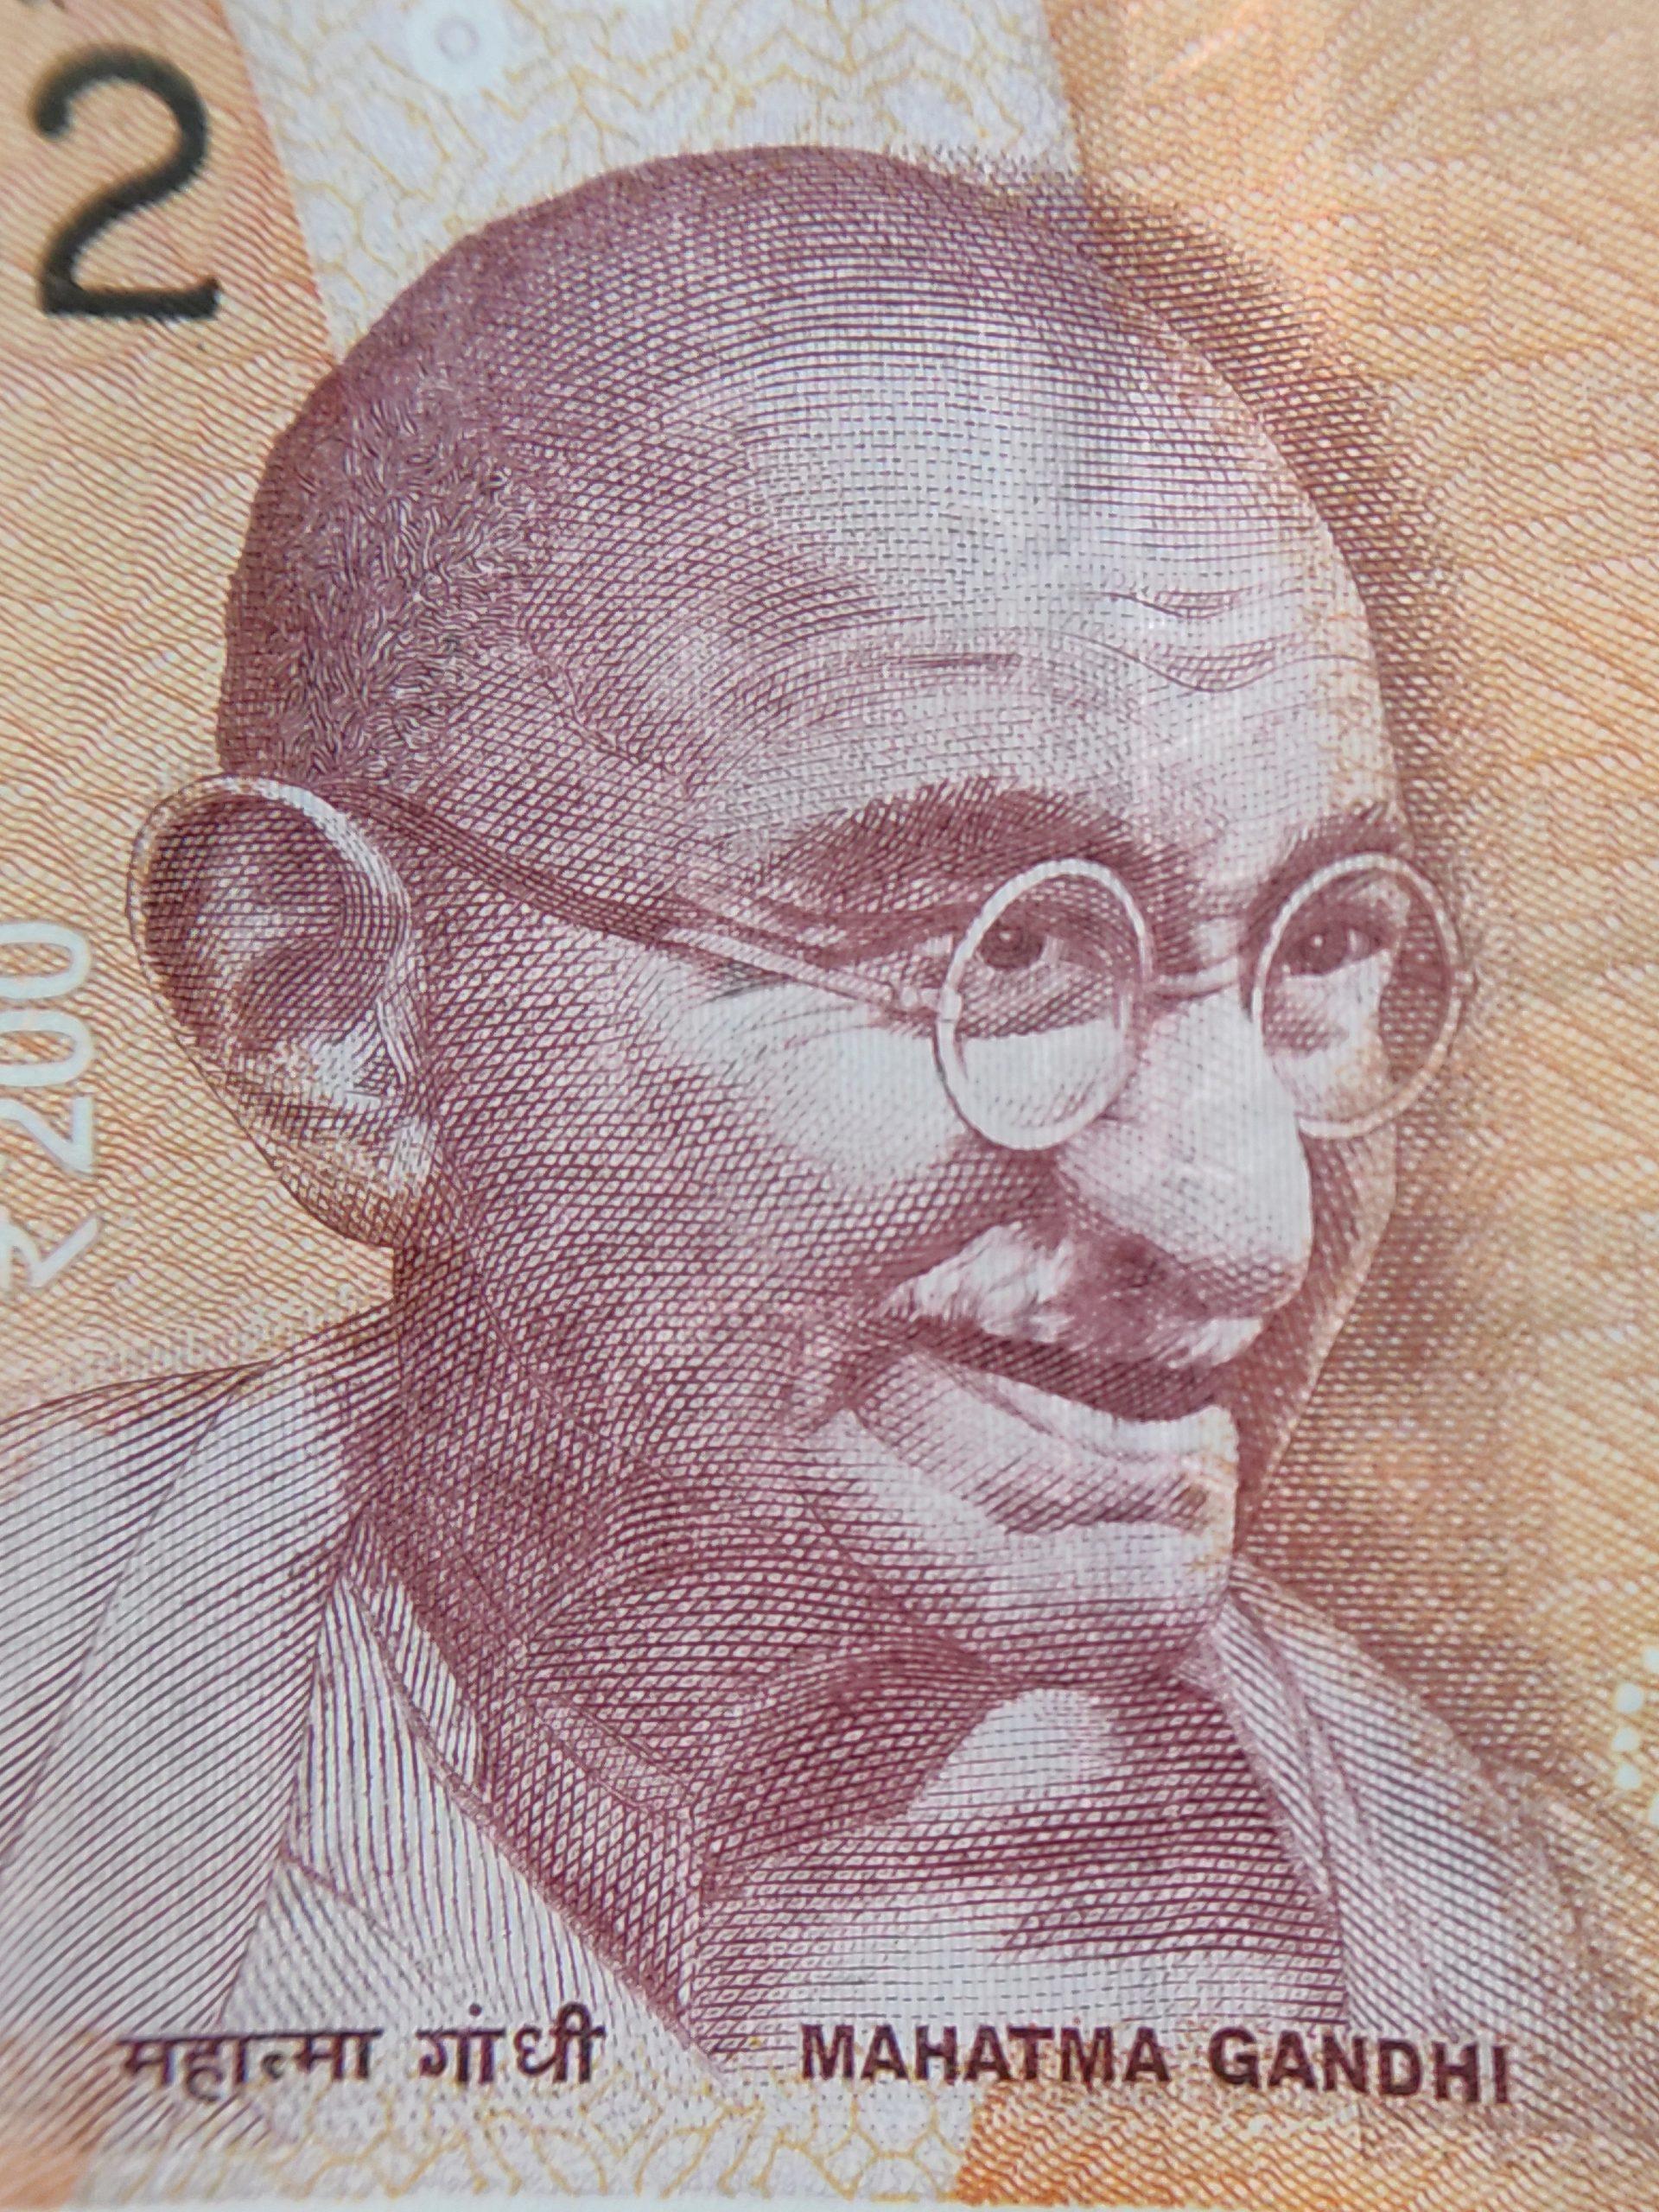 Mahatma Gandhi photo on currency note